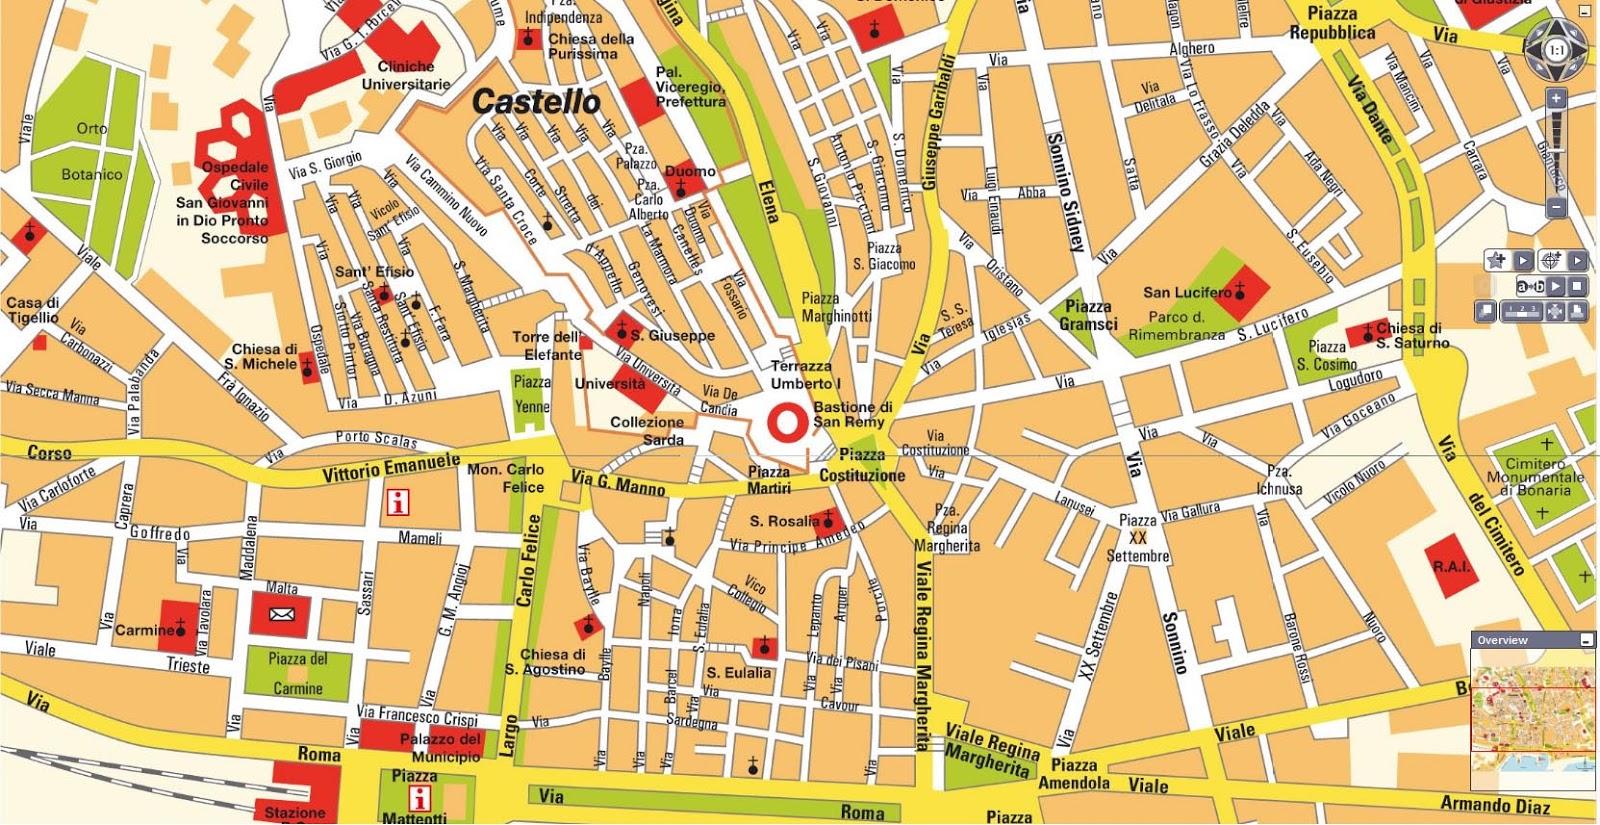 recensioni evasioni cagliari map - photo#29